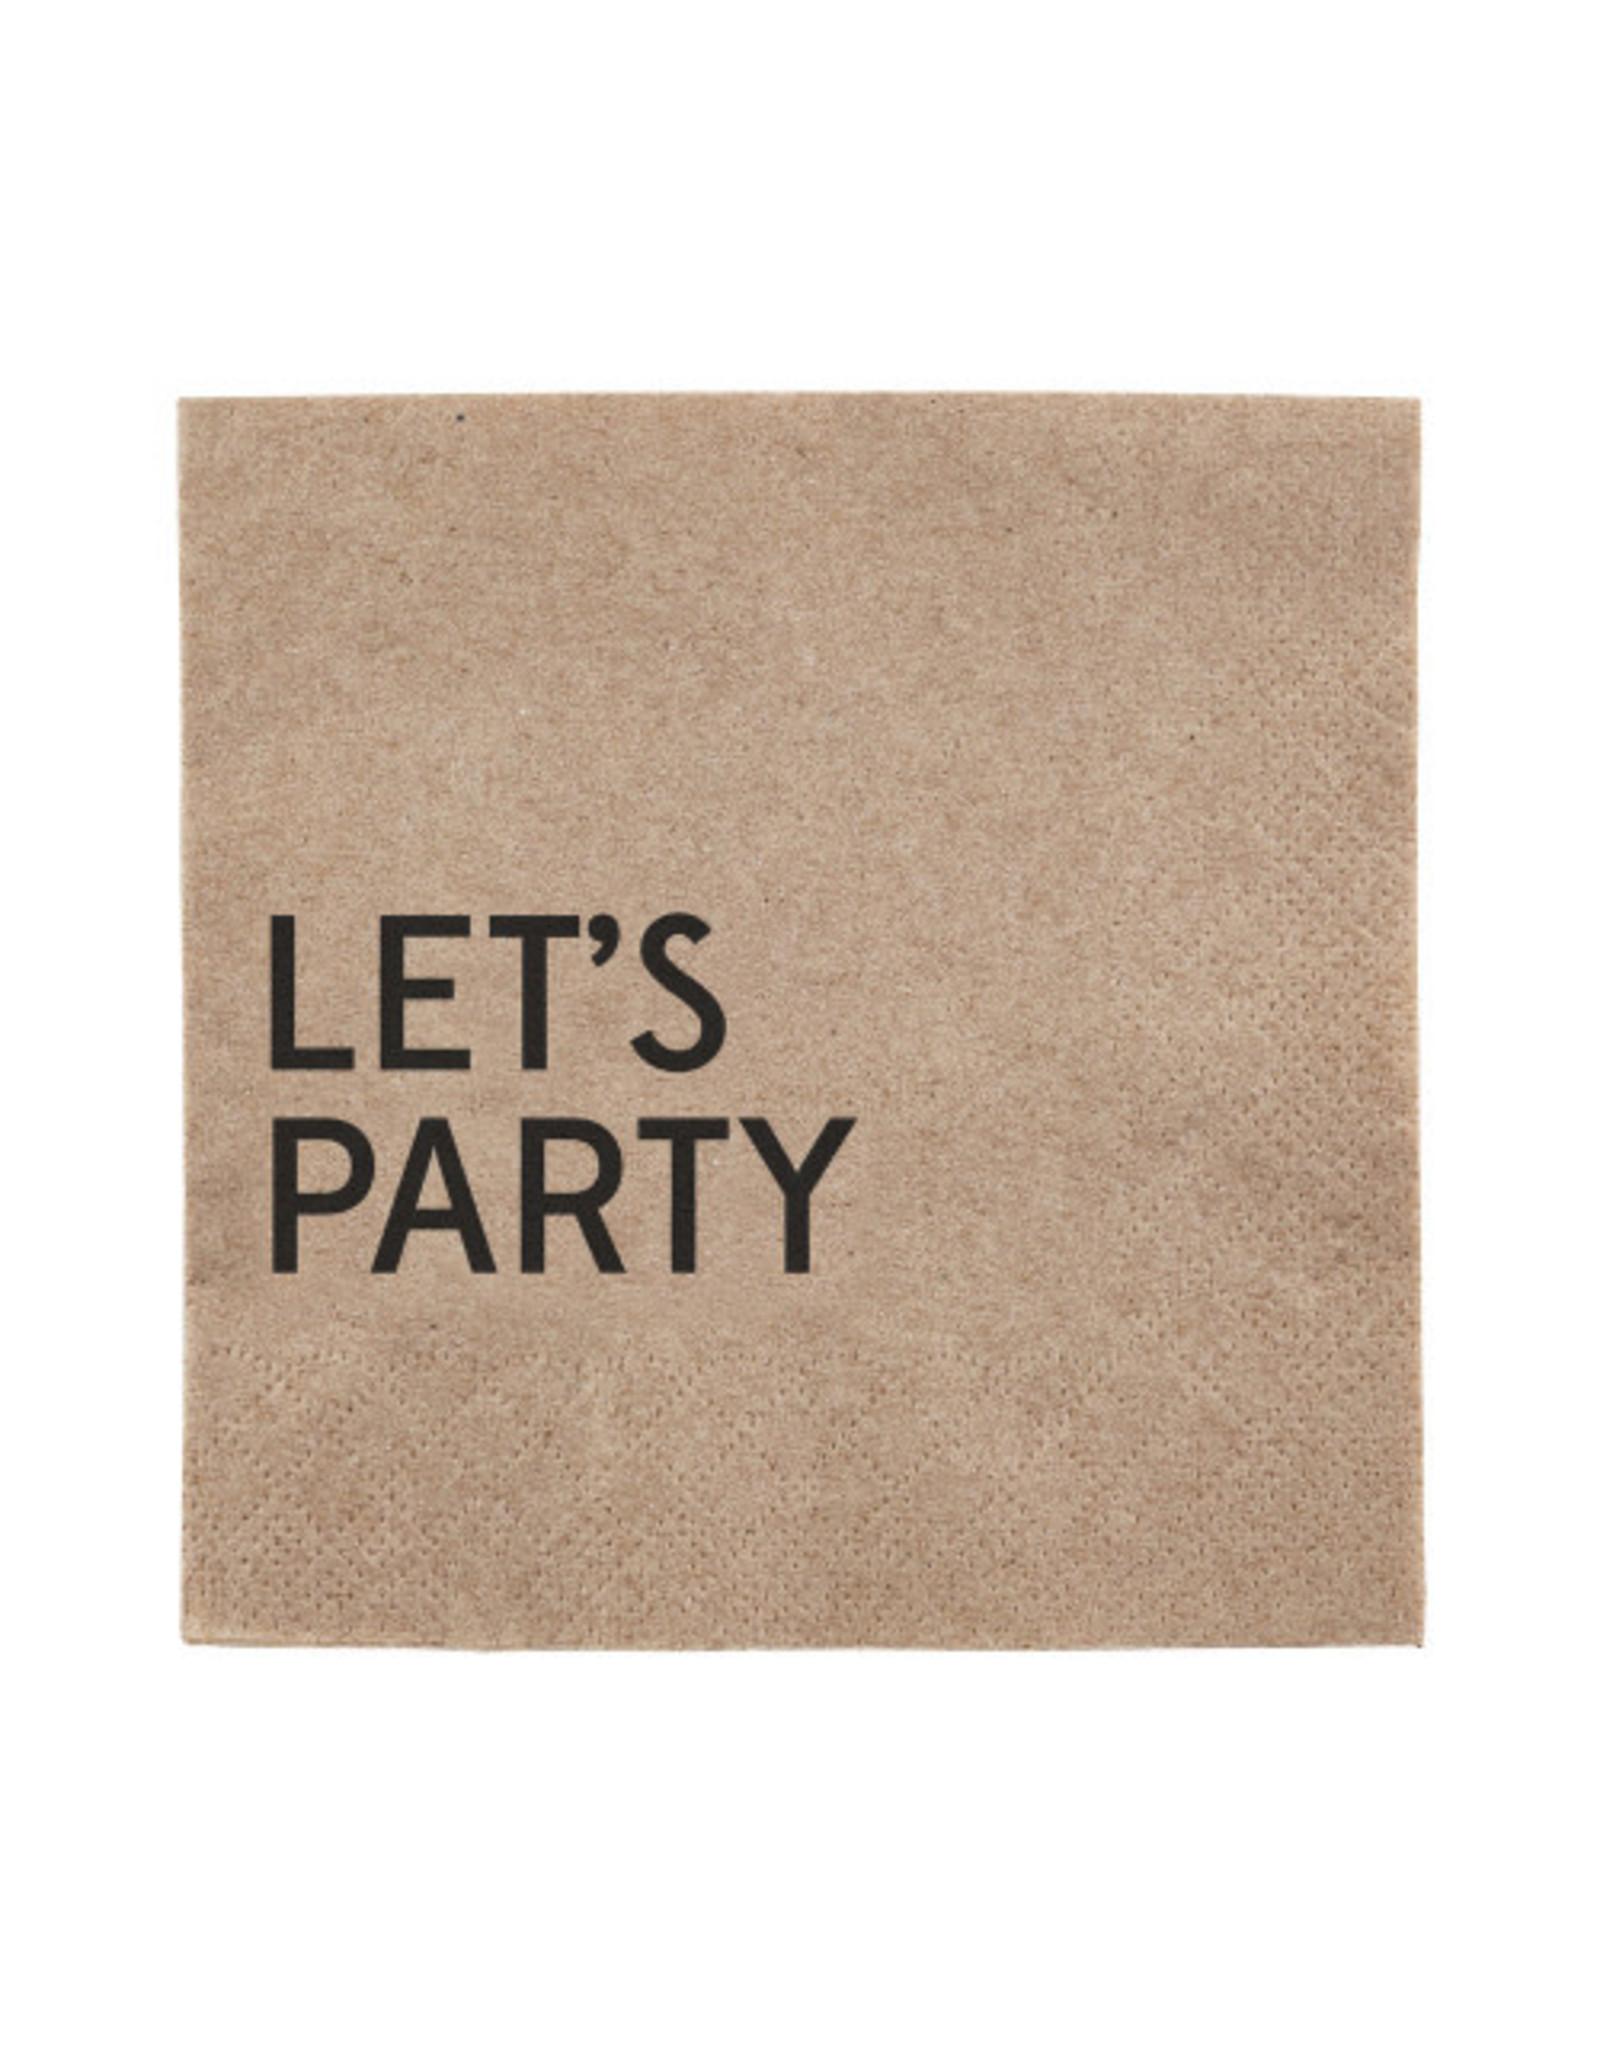 Creative Brands Beverage Napkin, Let's Party